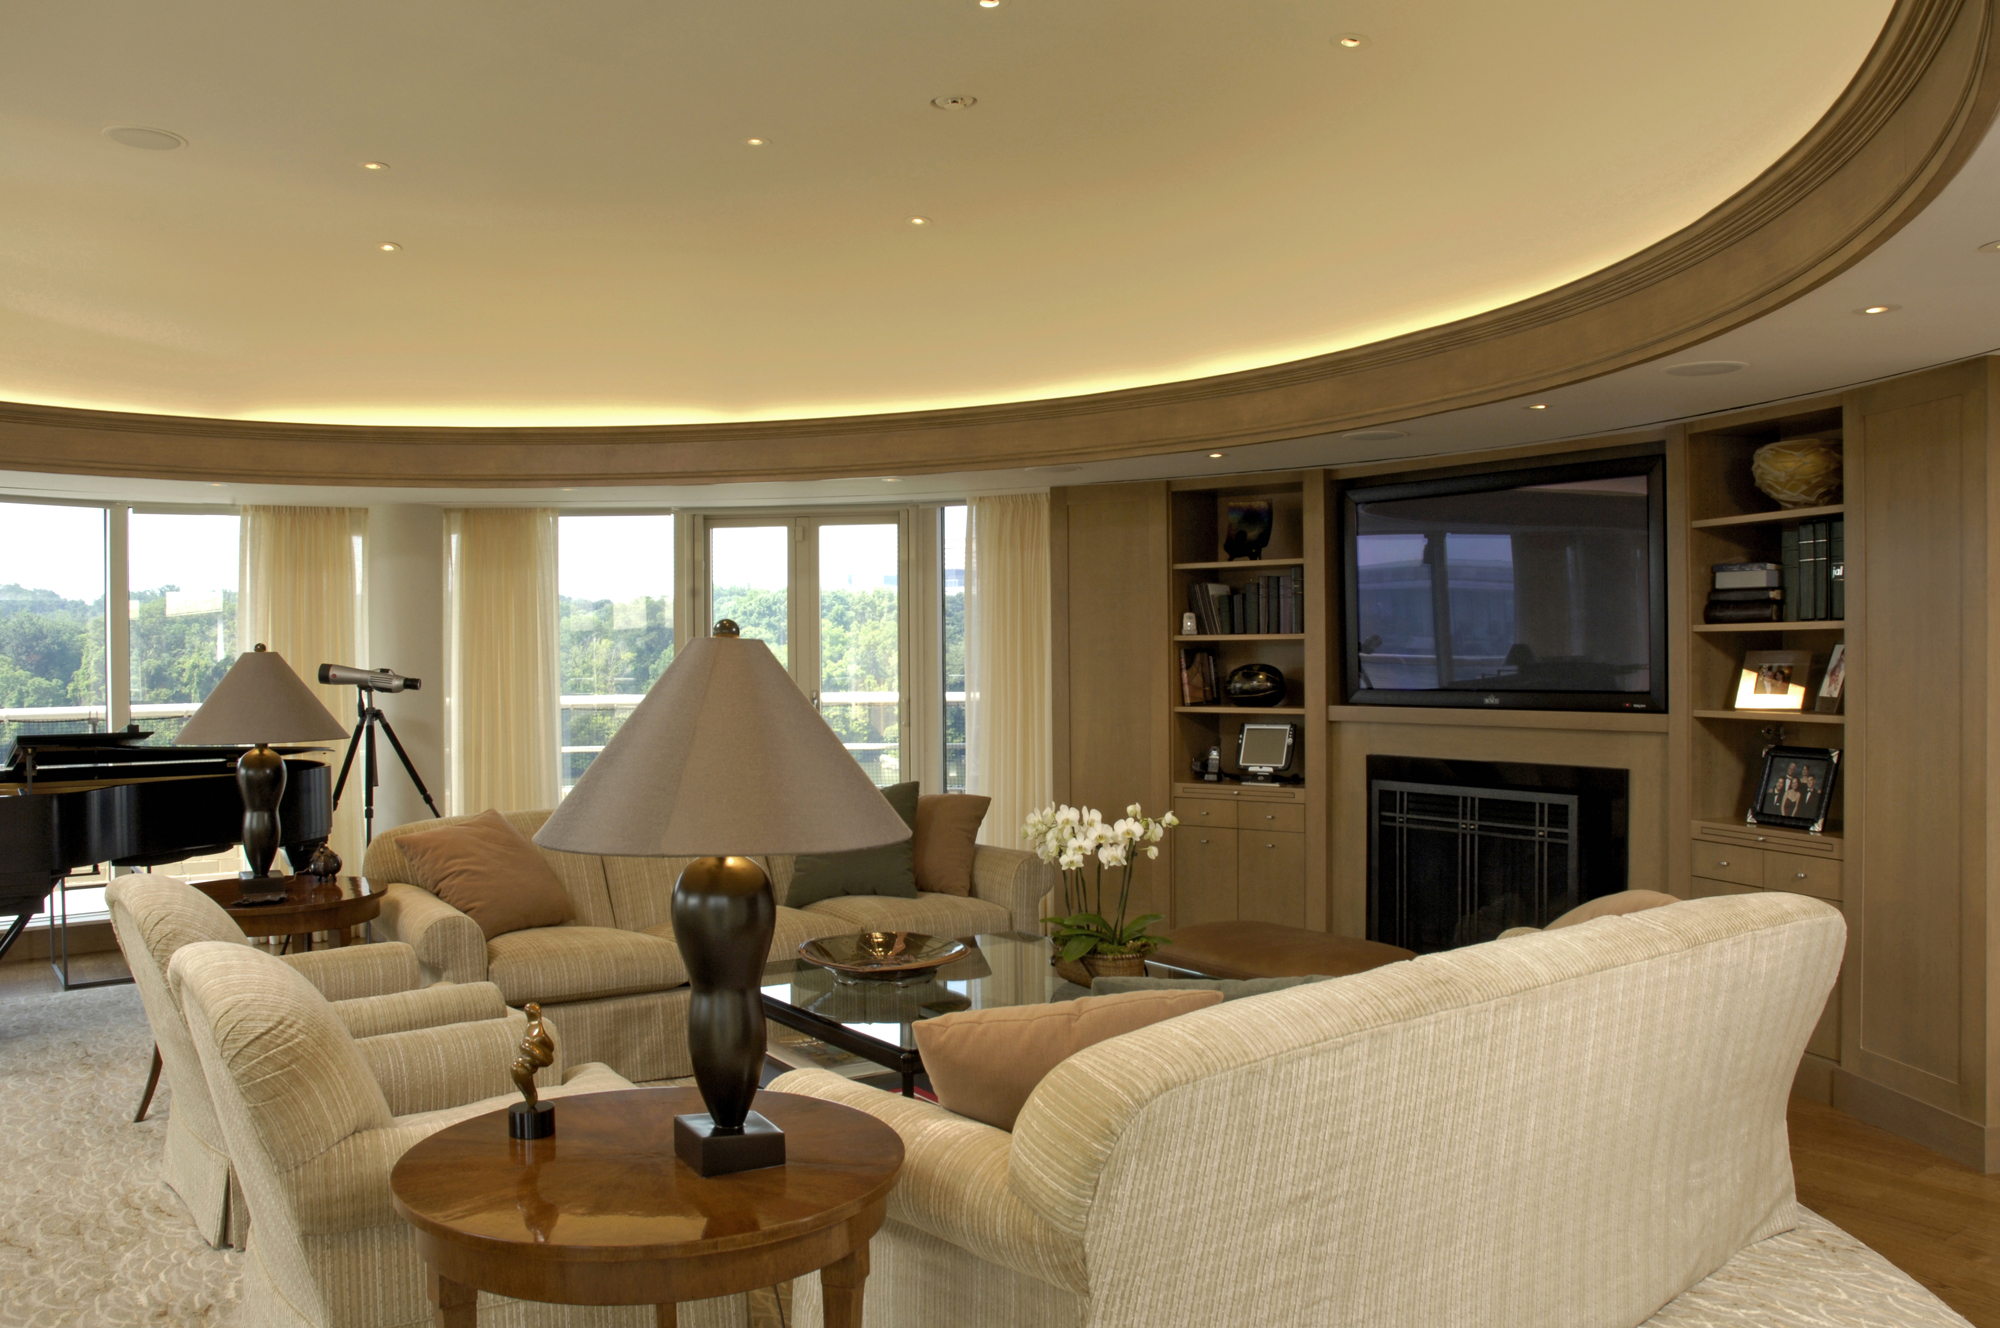 amazing award winning living room | Award-Winning Condominium Penthouse Renovation in ...